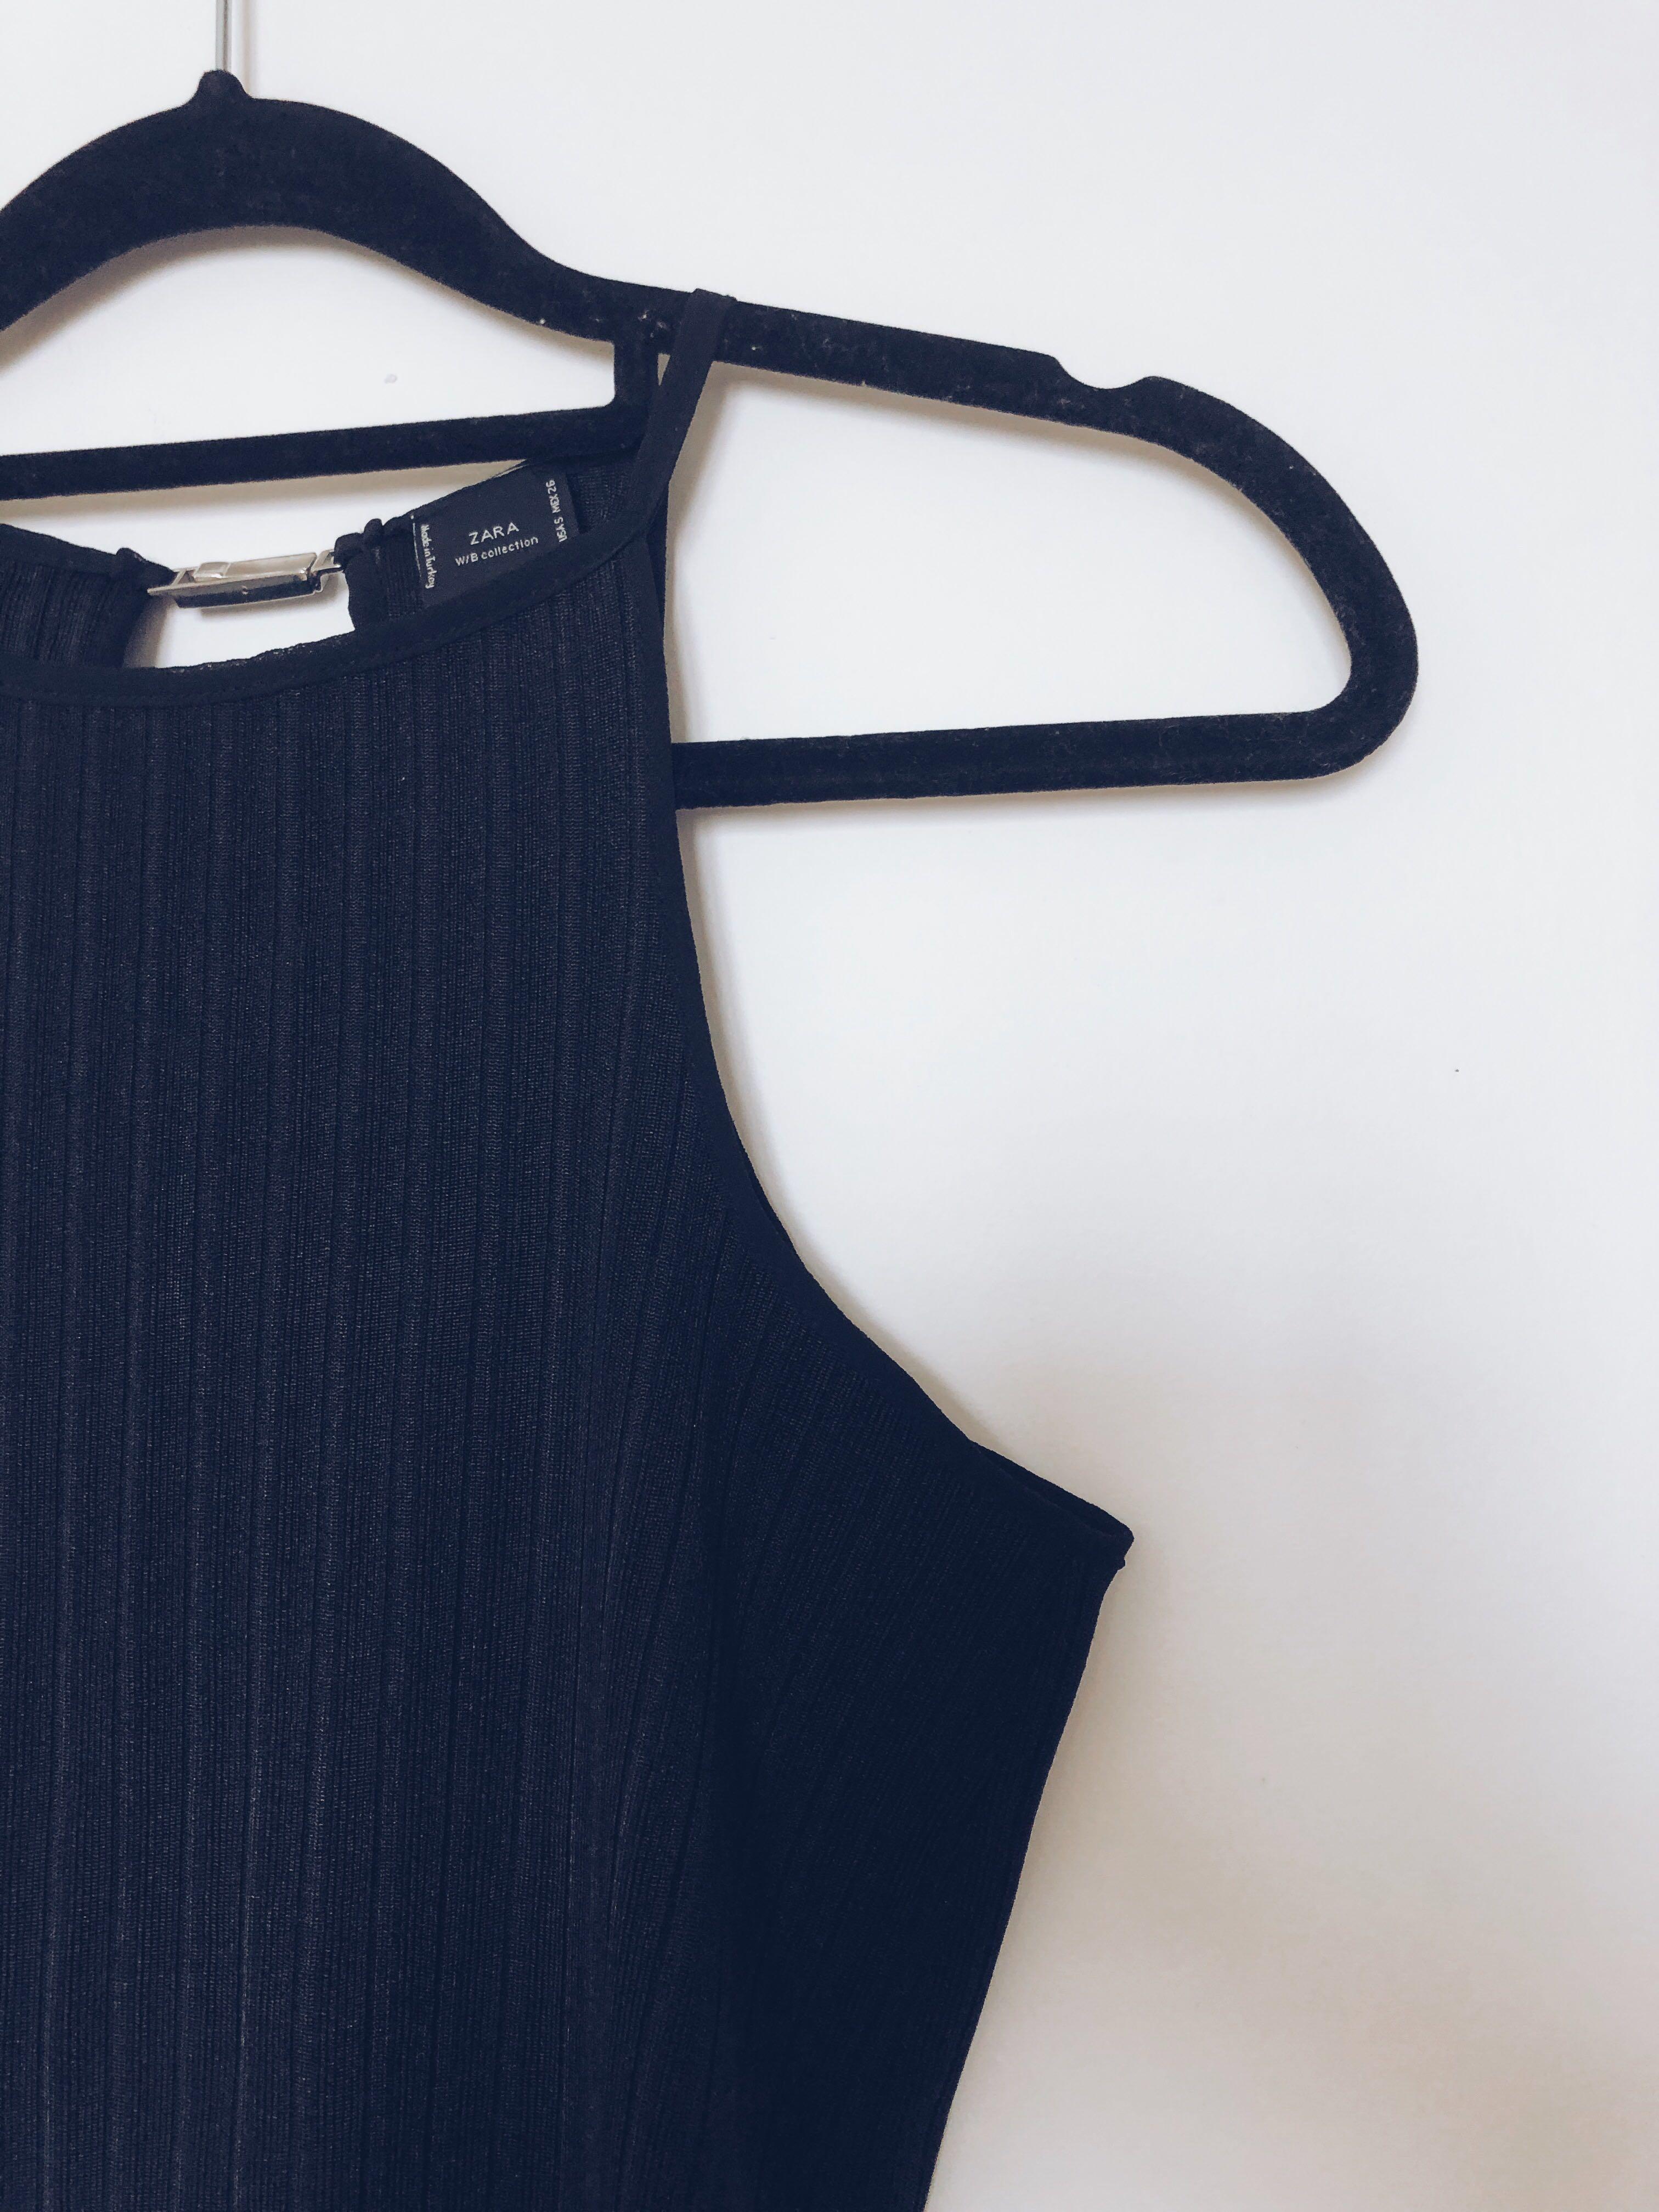 SALE] ZARA cropped tank top, Women's Fashion, Clothes, Tops